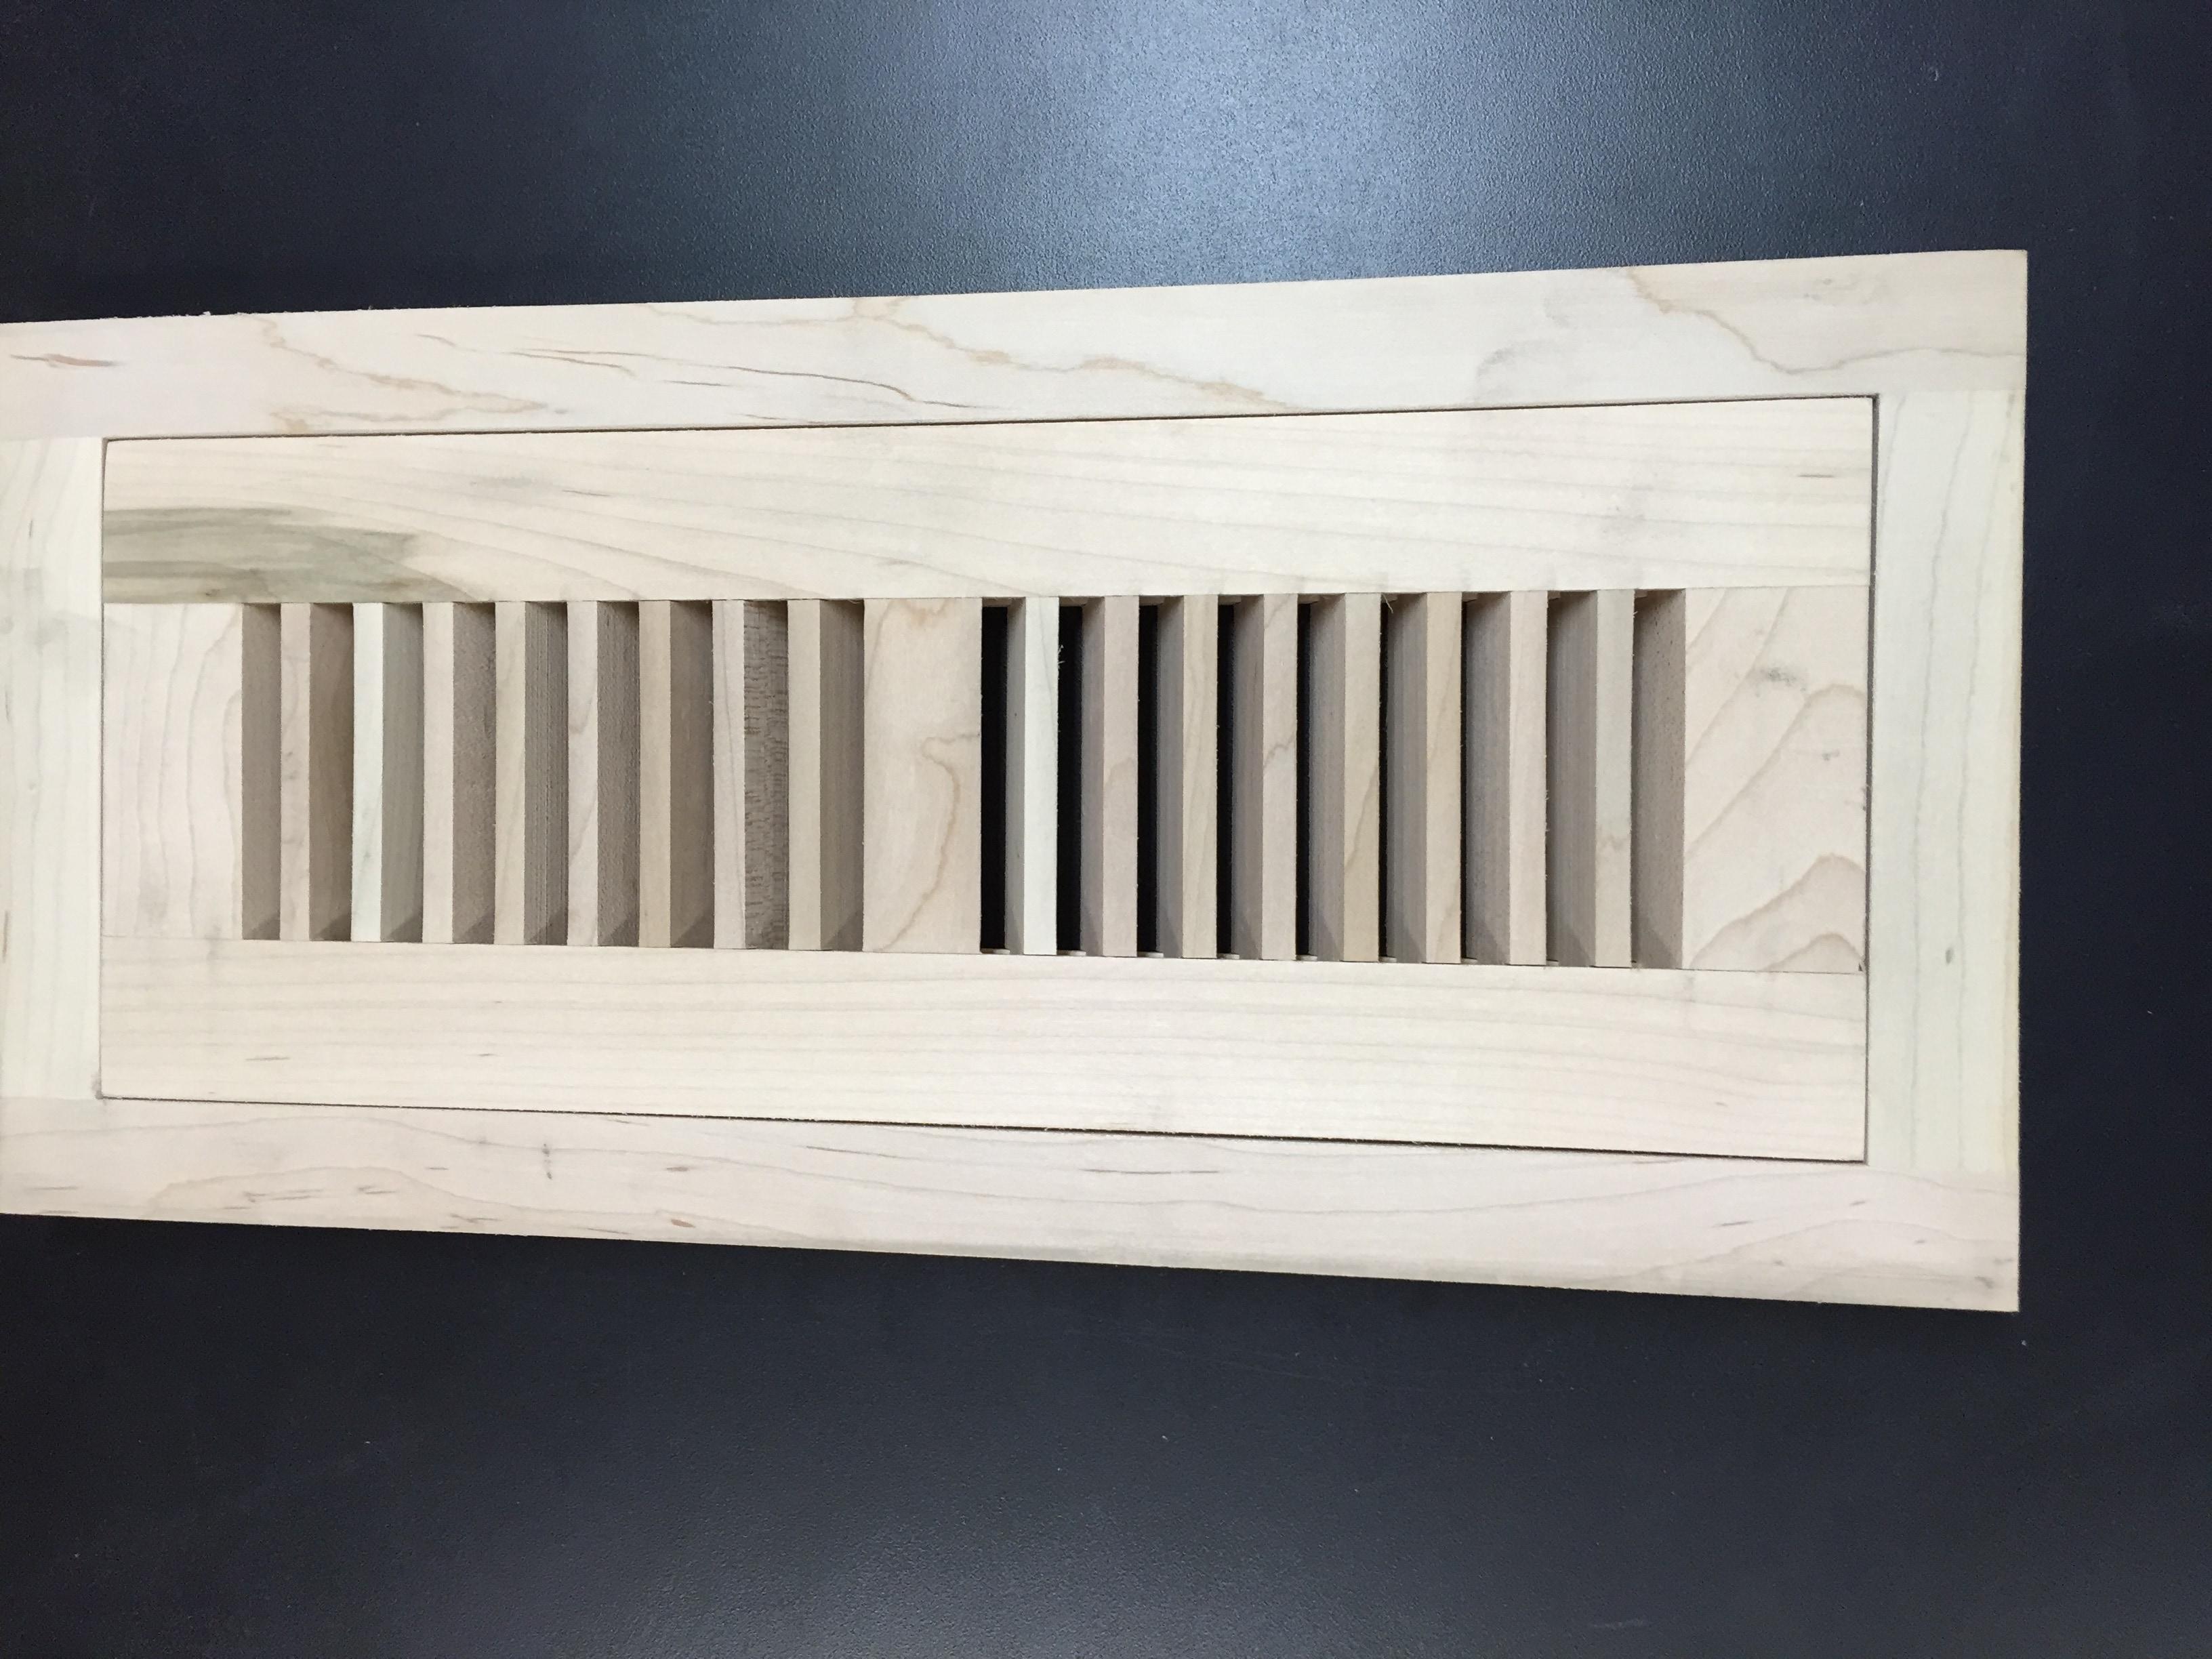 "Flushmount Unfinished Vent / Hard Maple / 6"" X 10"" / Flushmount Vent Floor Molding - Flush Mount Hardwood Floor Vents 0"